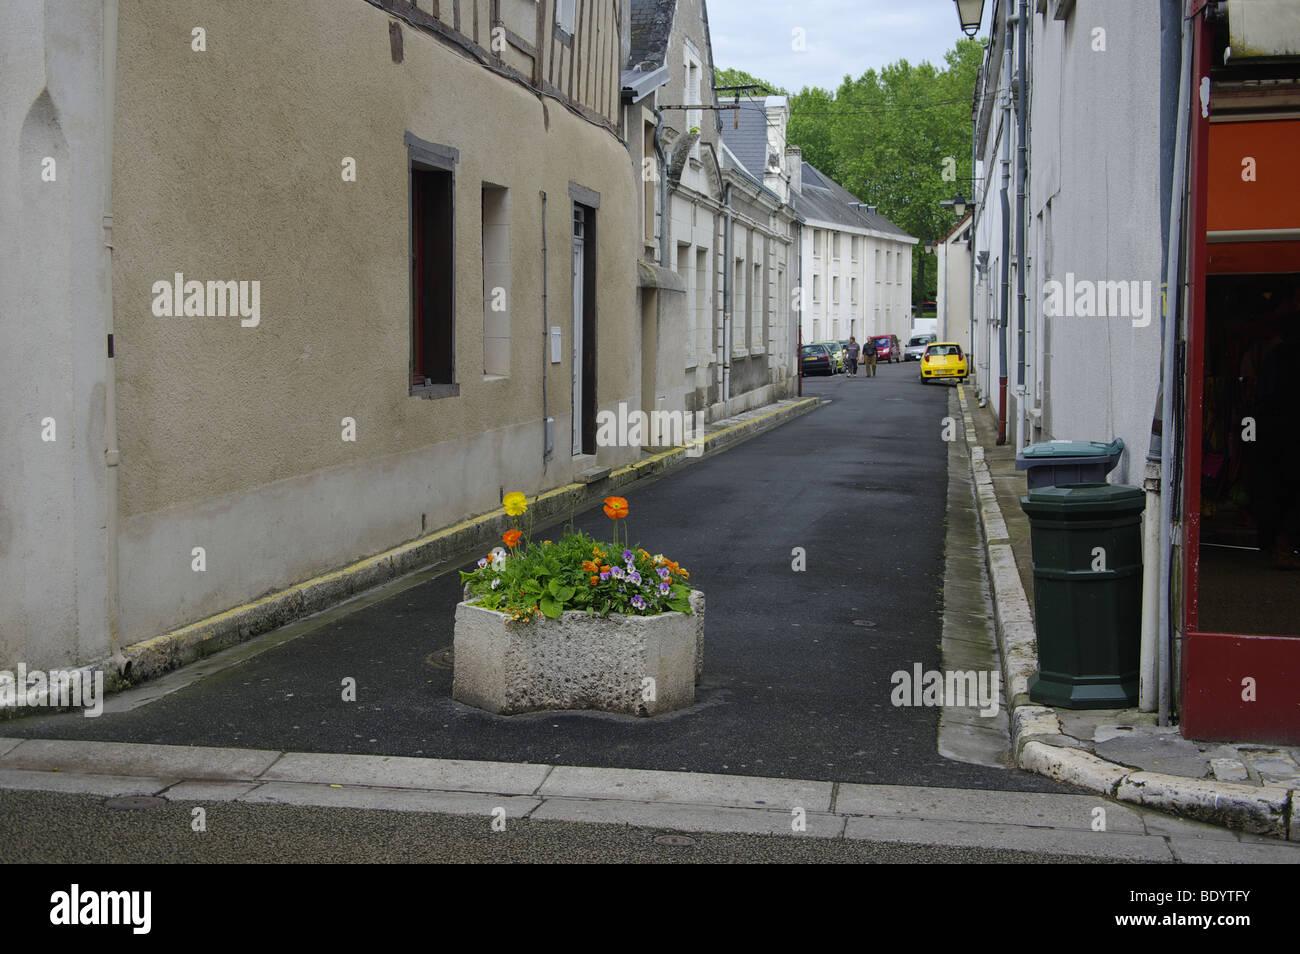 street scene france Stock Photo